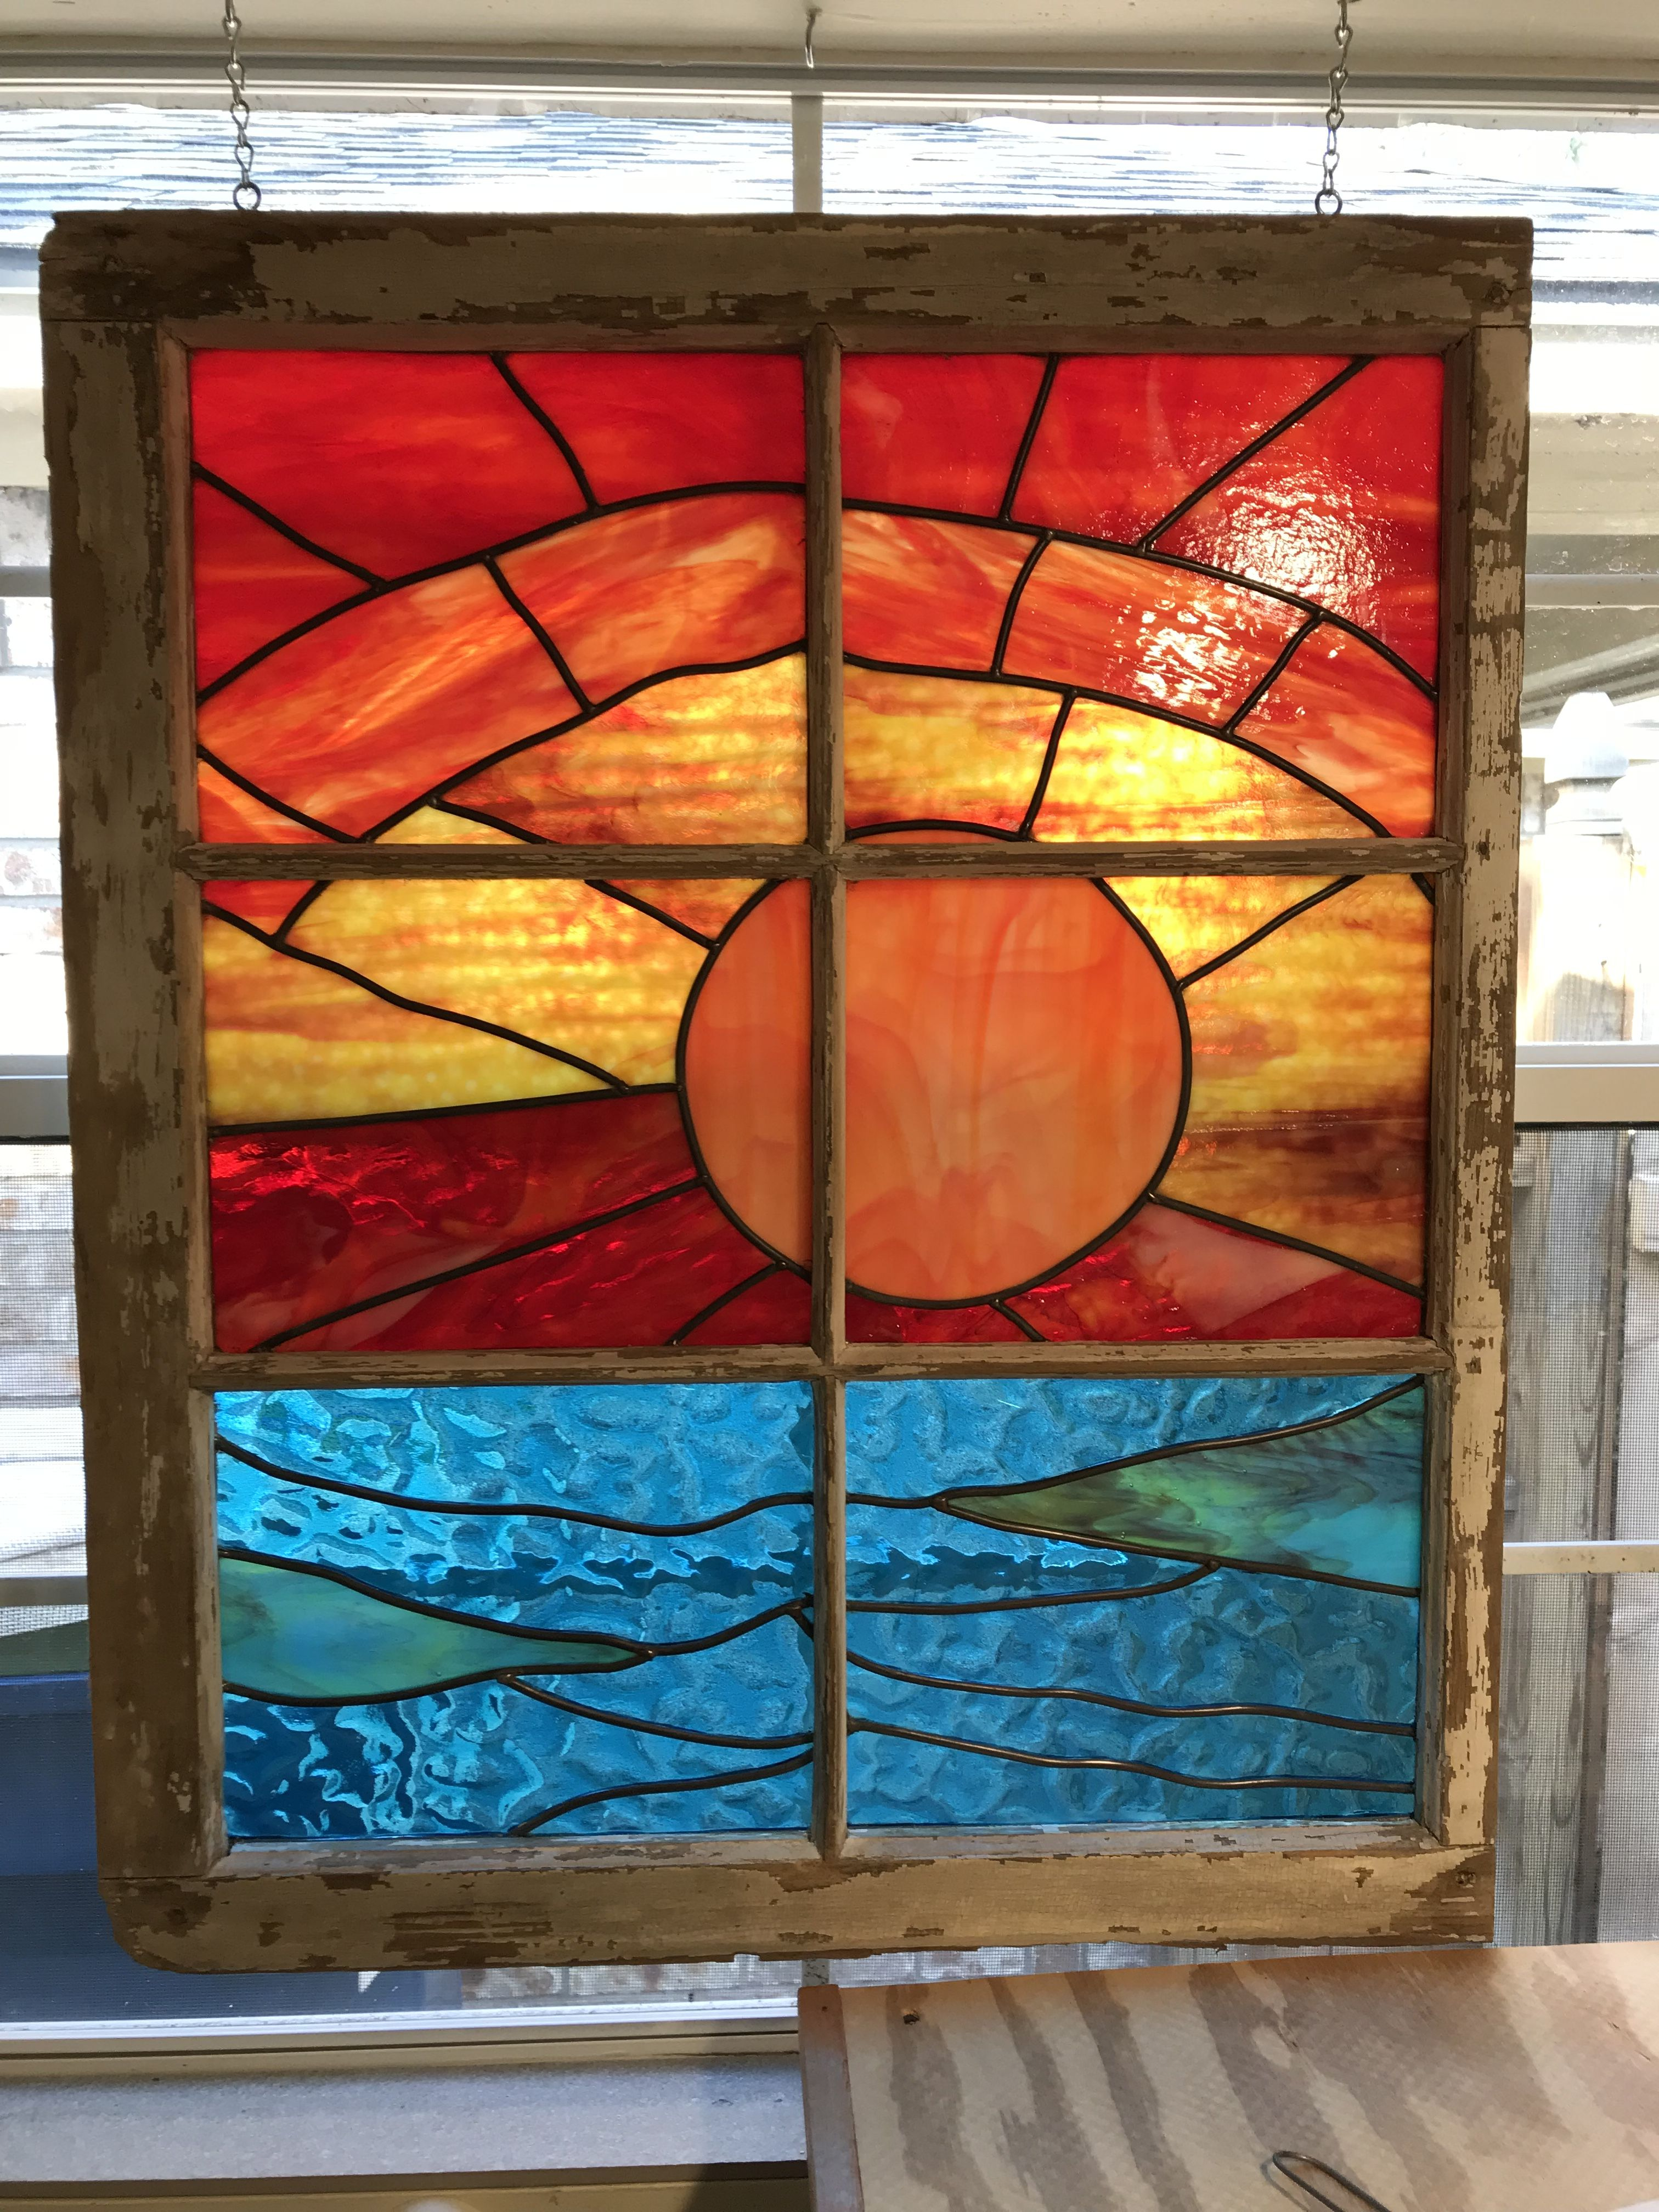 Pin de Amanda Renfrow en stained glass | Pinterest | Mosaicos y ...